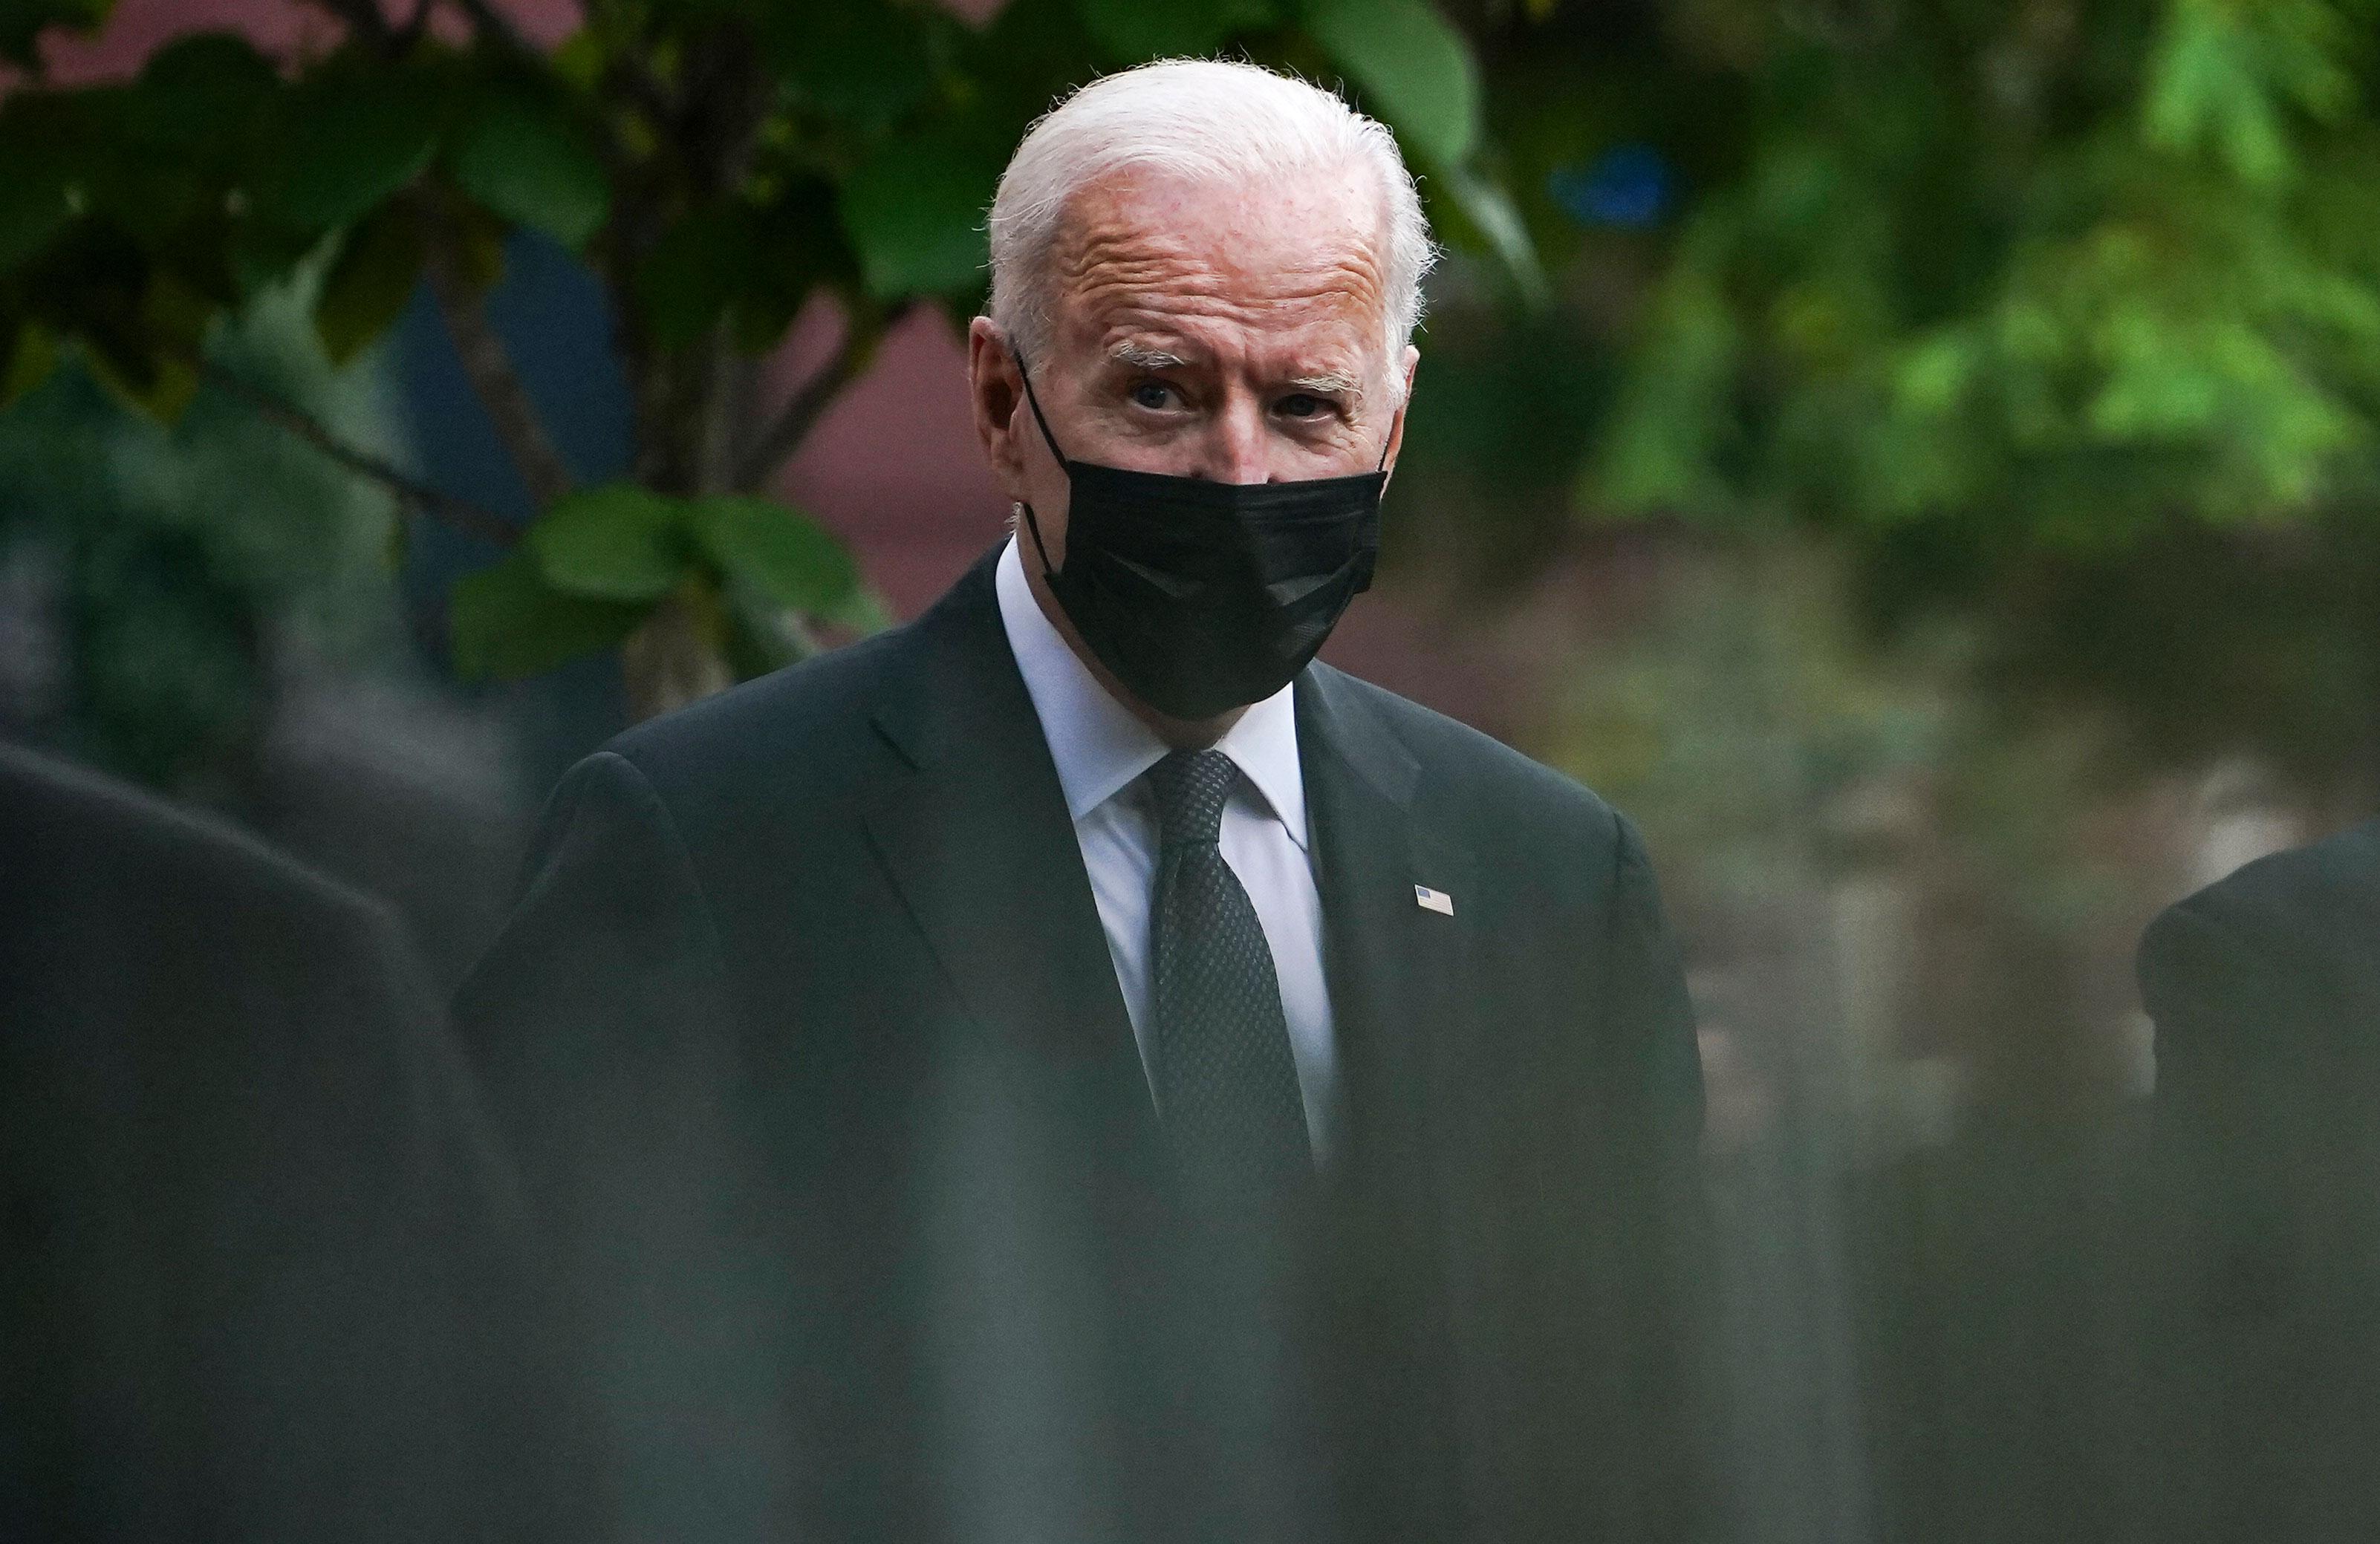 President Joe Biden leaves Holy Trinity church in the Georgetown neighborhood of Washington, DC, on August 29.